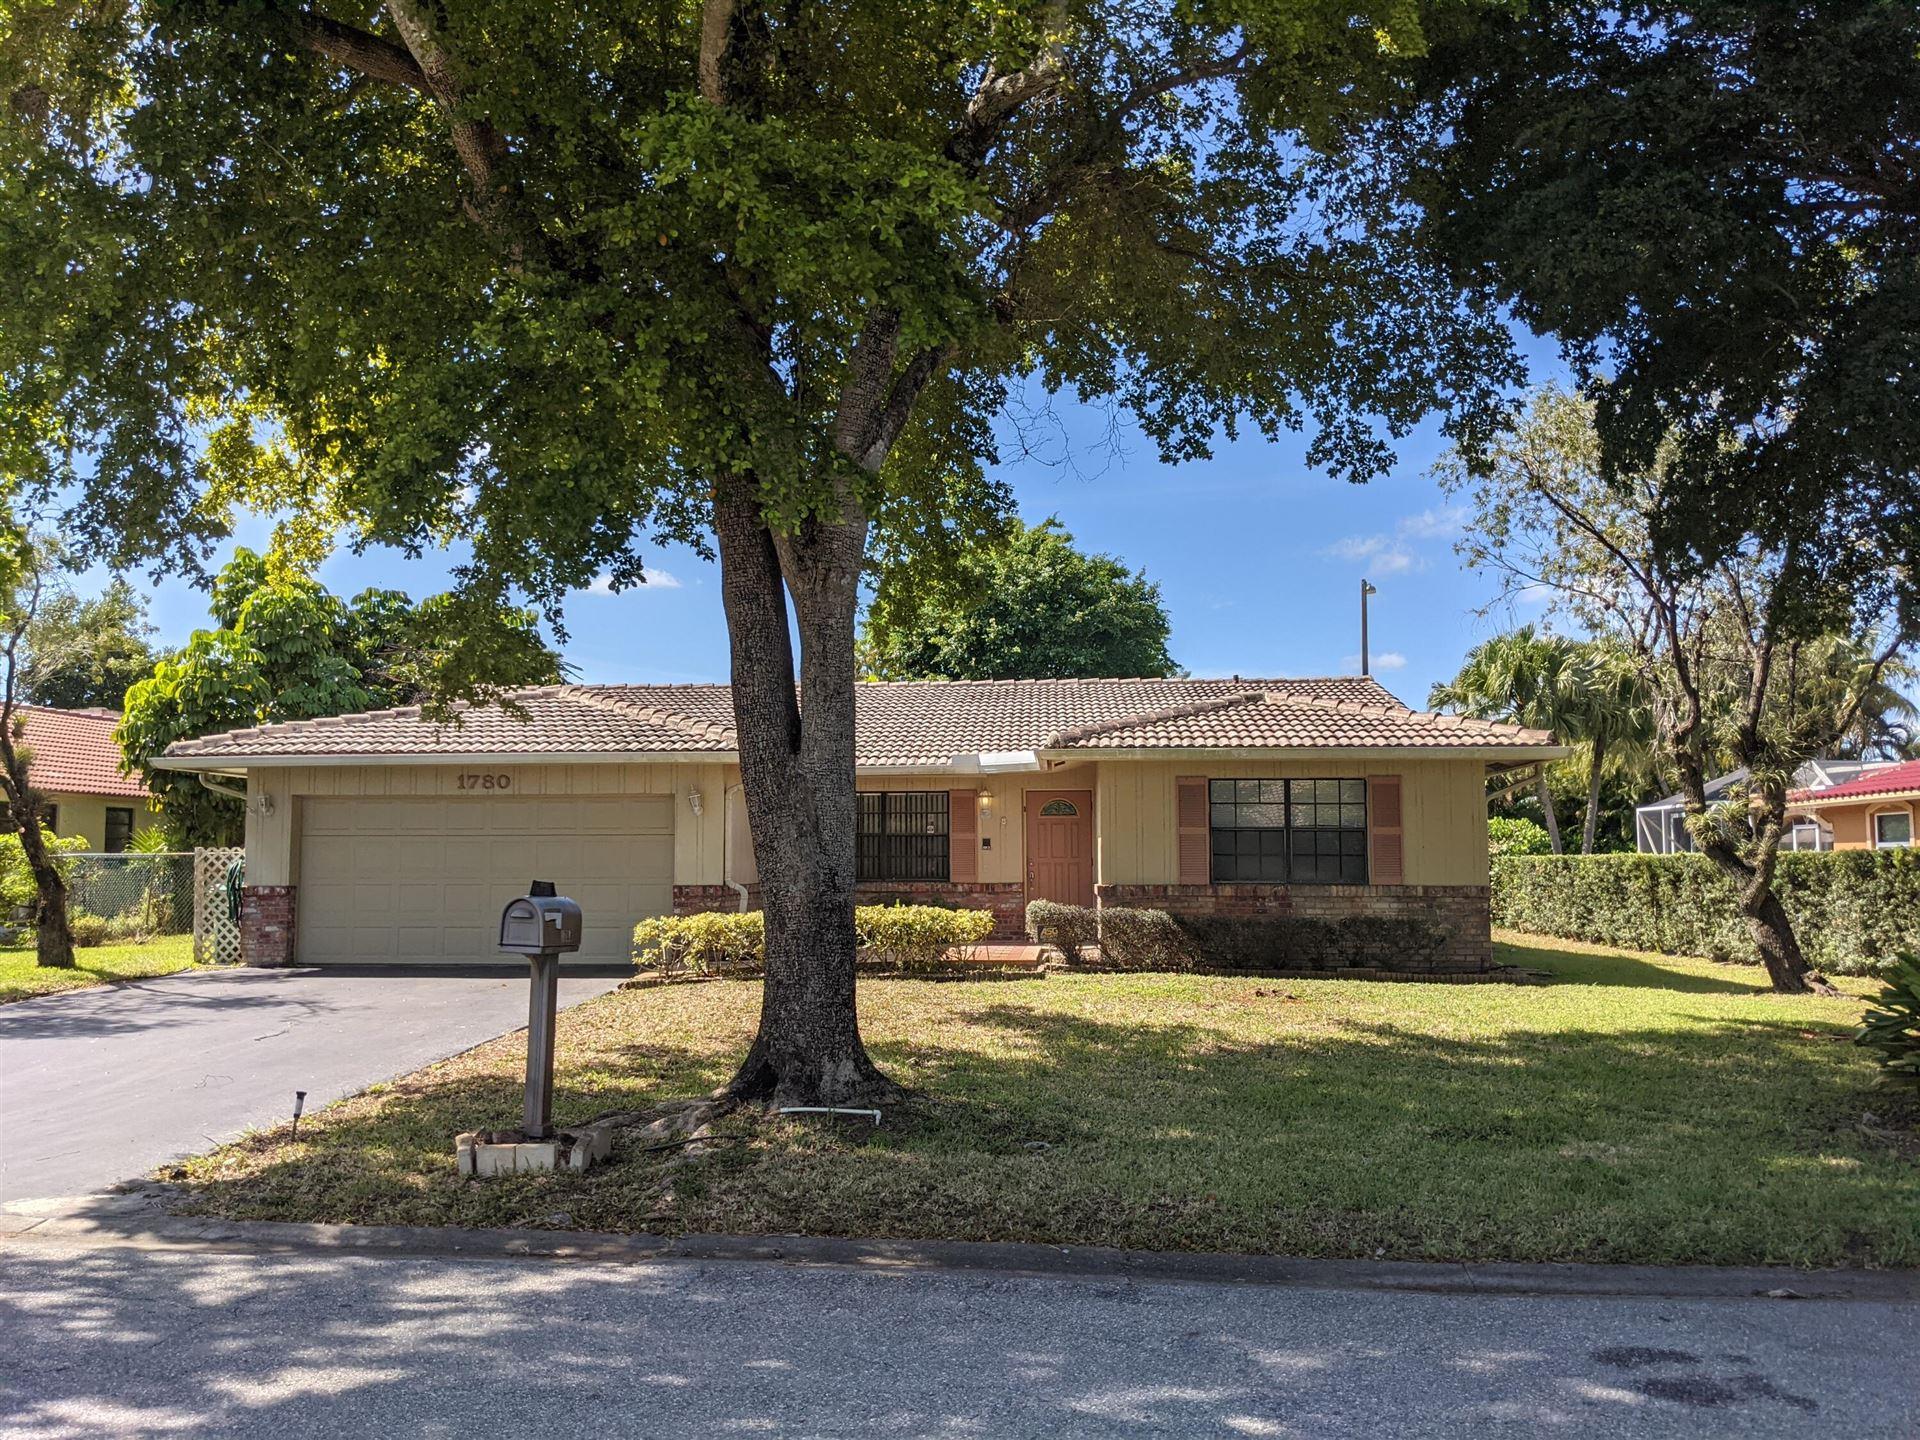 1780 NW 104th Avenue, Coral Springs, FL 33071 - MLS#: RX-10752948